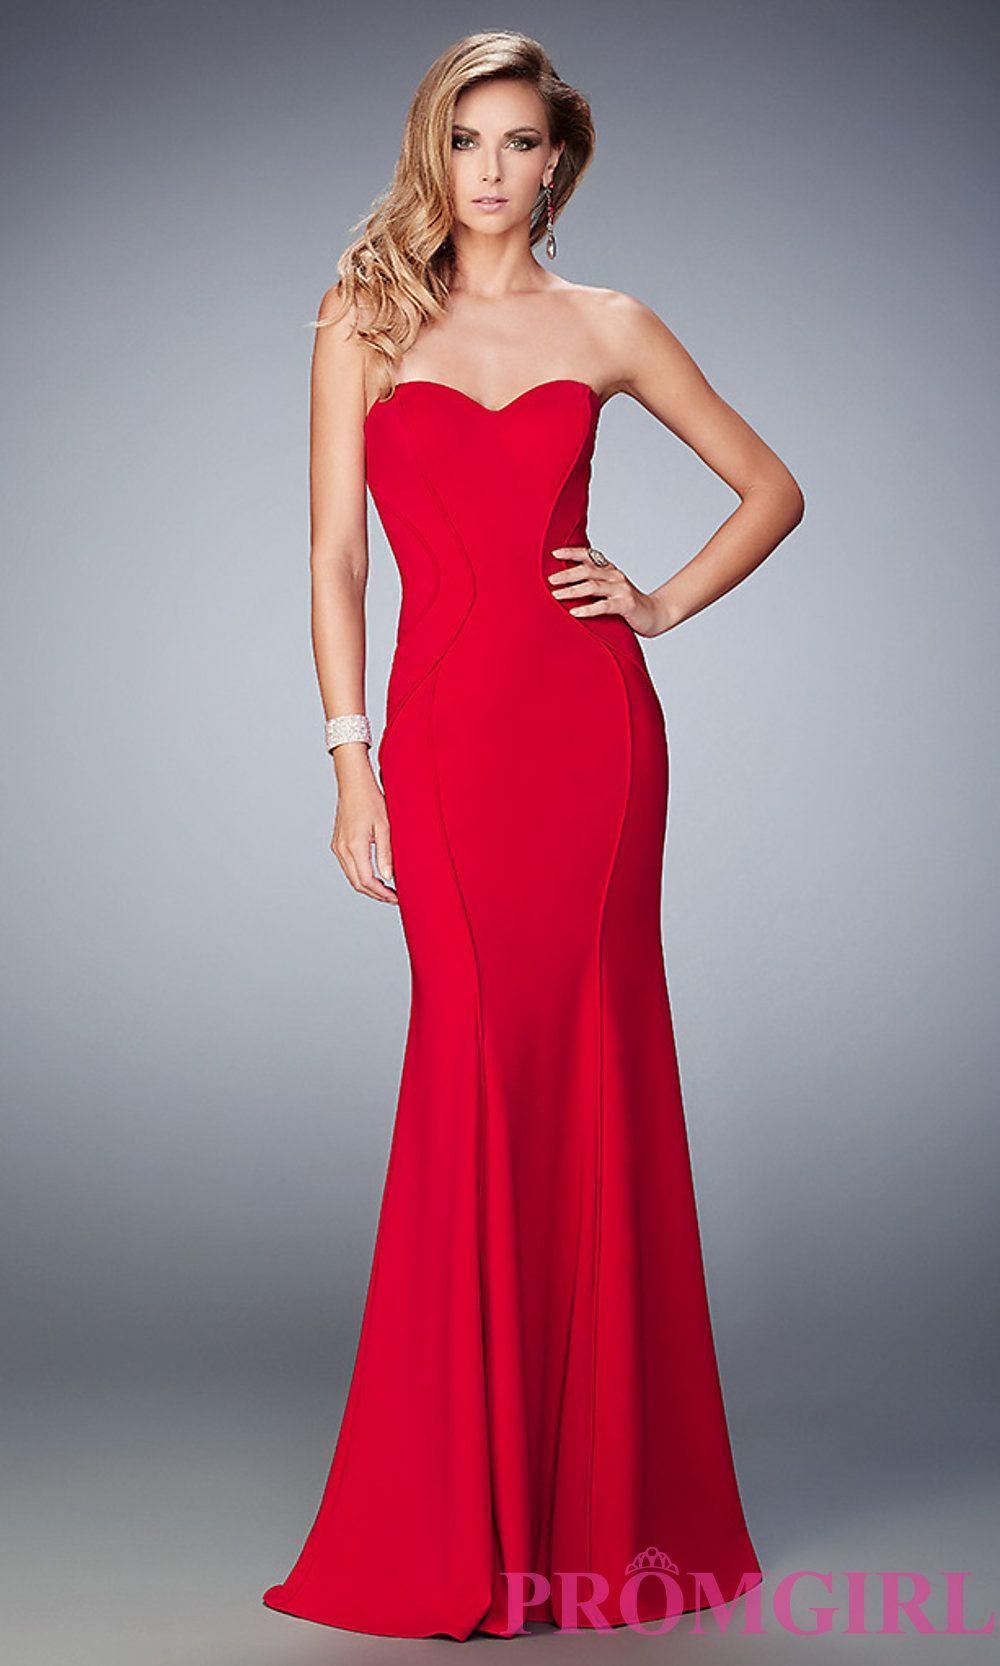 Classic La Femme Long Strapless Sweetheart Prom Dress Style: LF ...